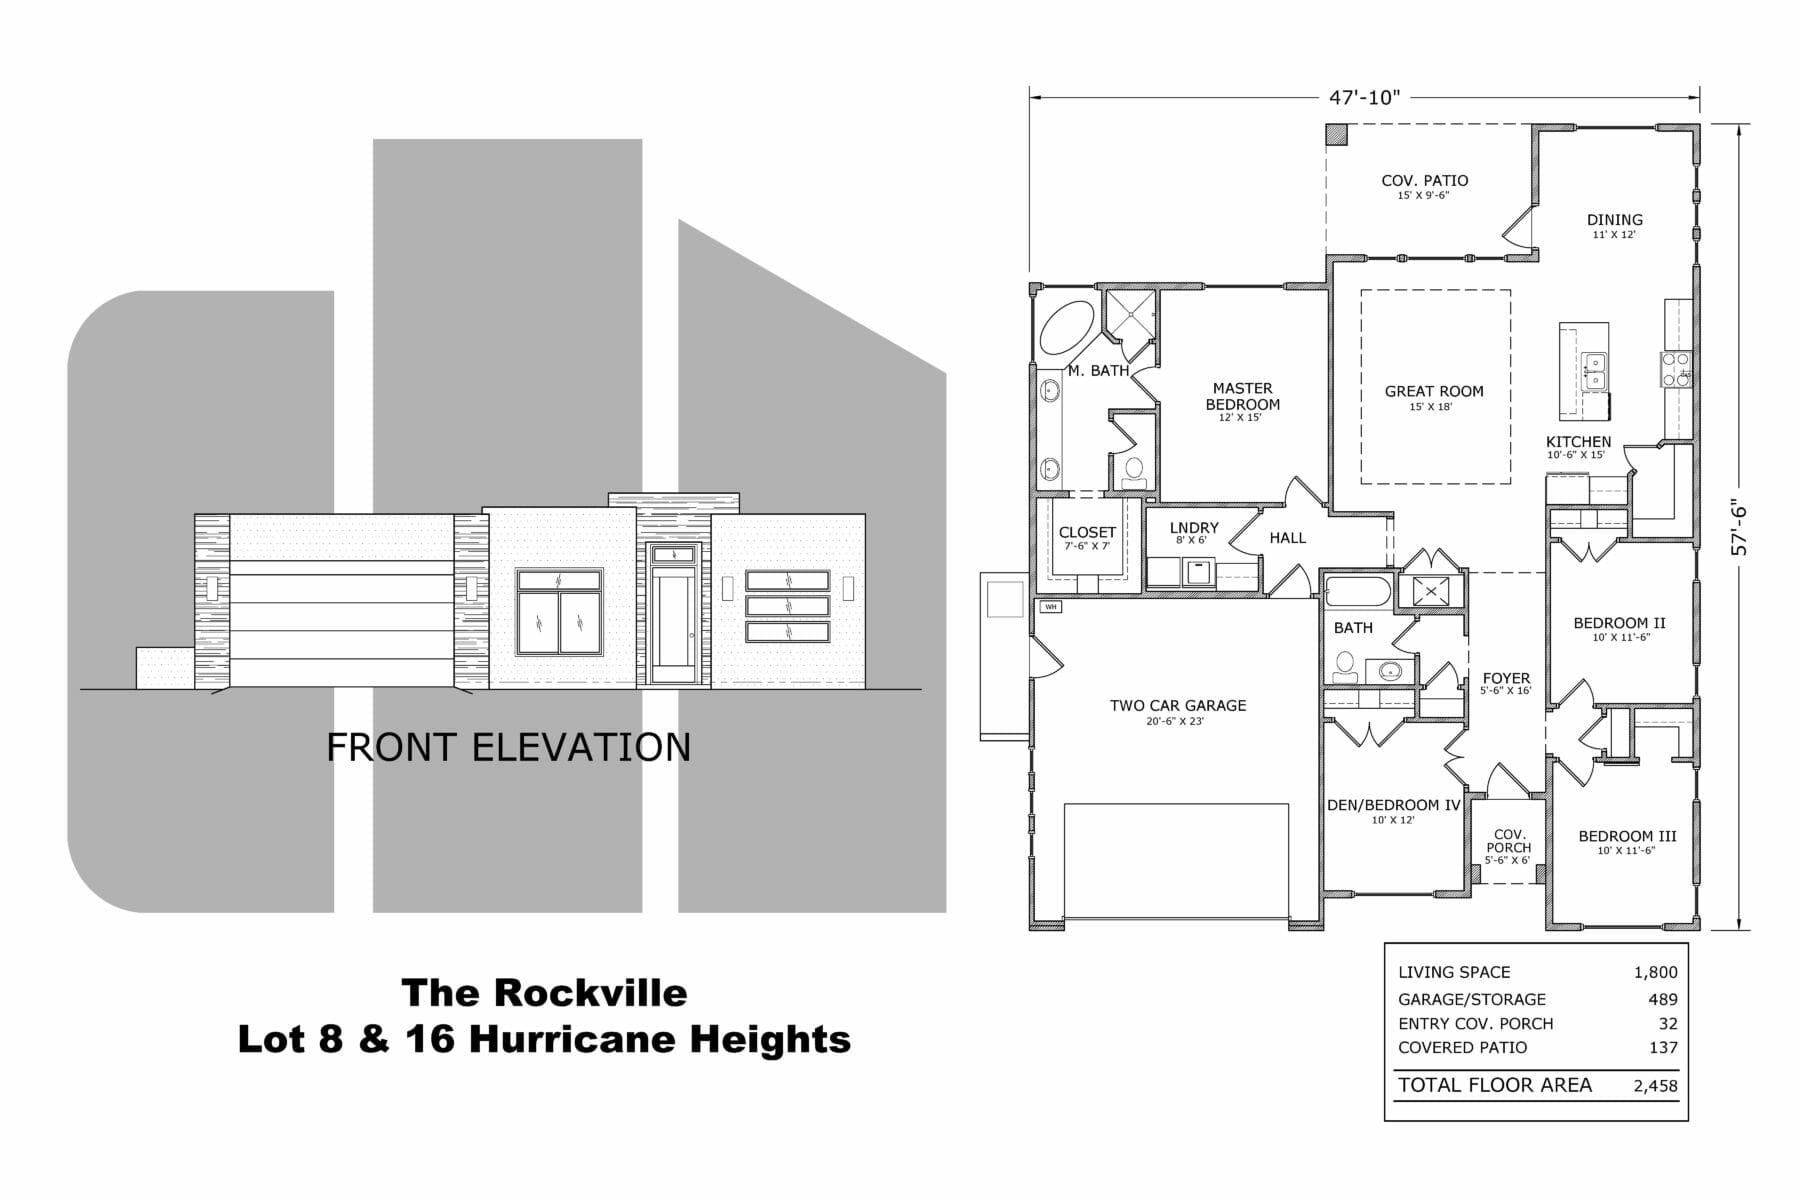 New Home Floor Plans In Utah Unique Floor Plans Self Help Homes